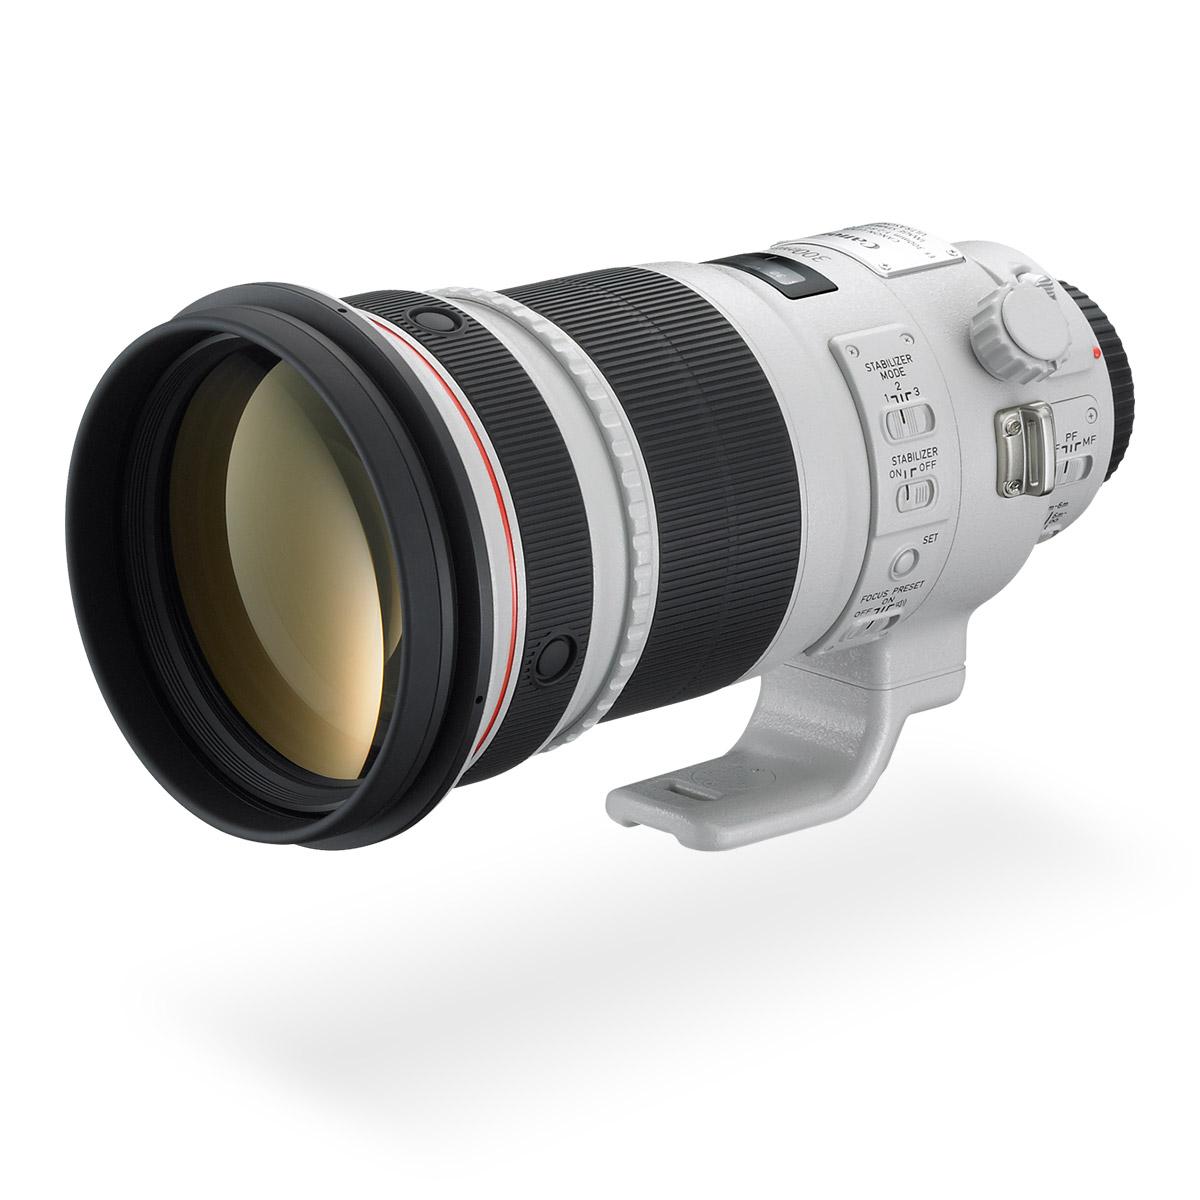 EF 300mm f/2.8L IS II USM